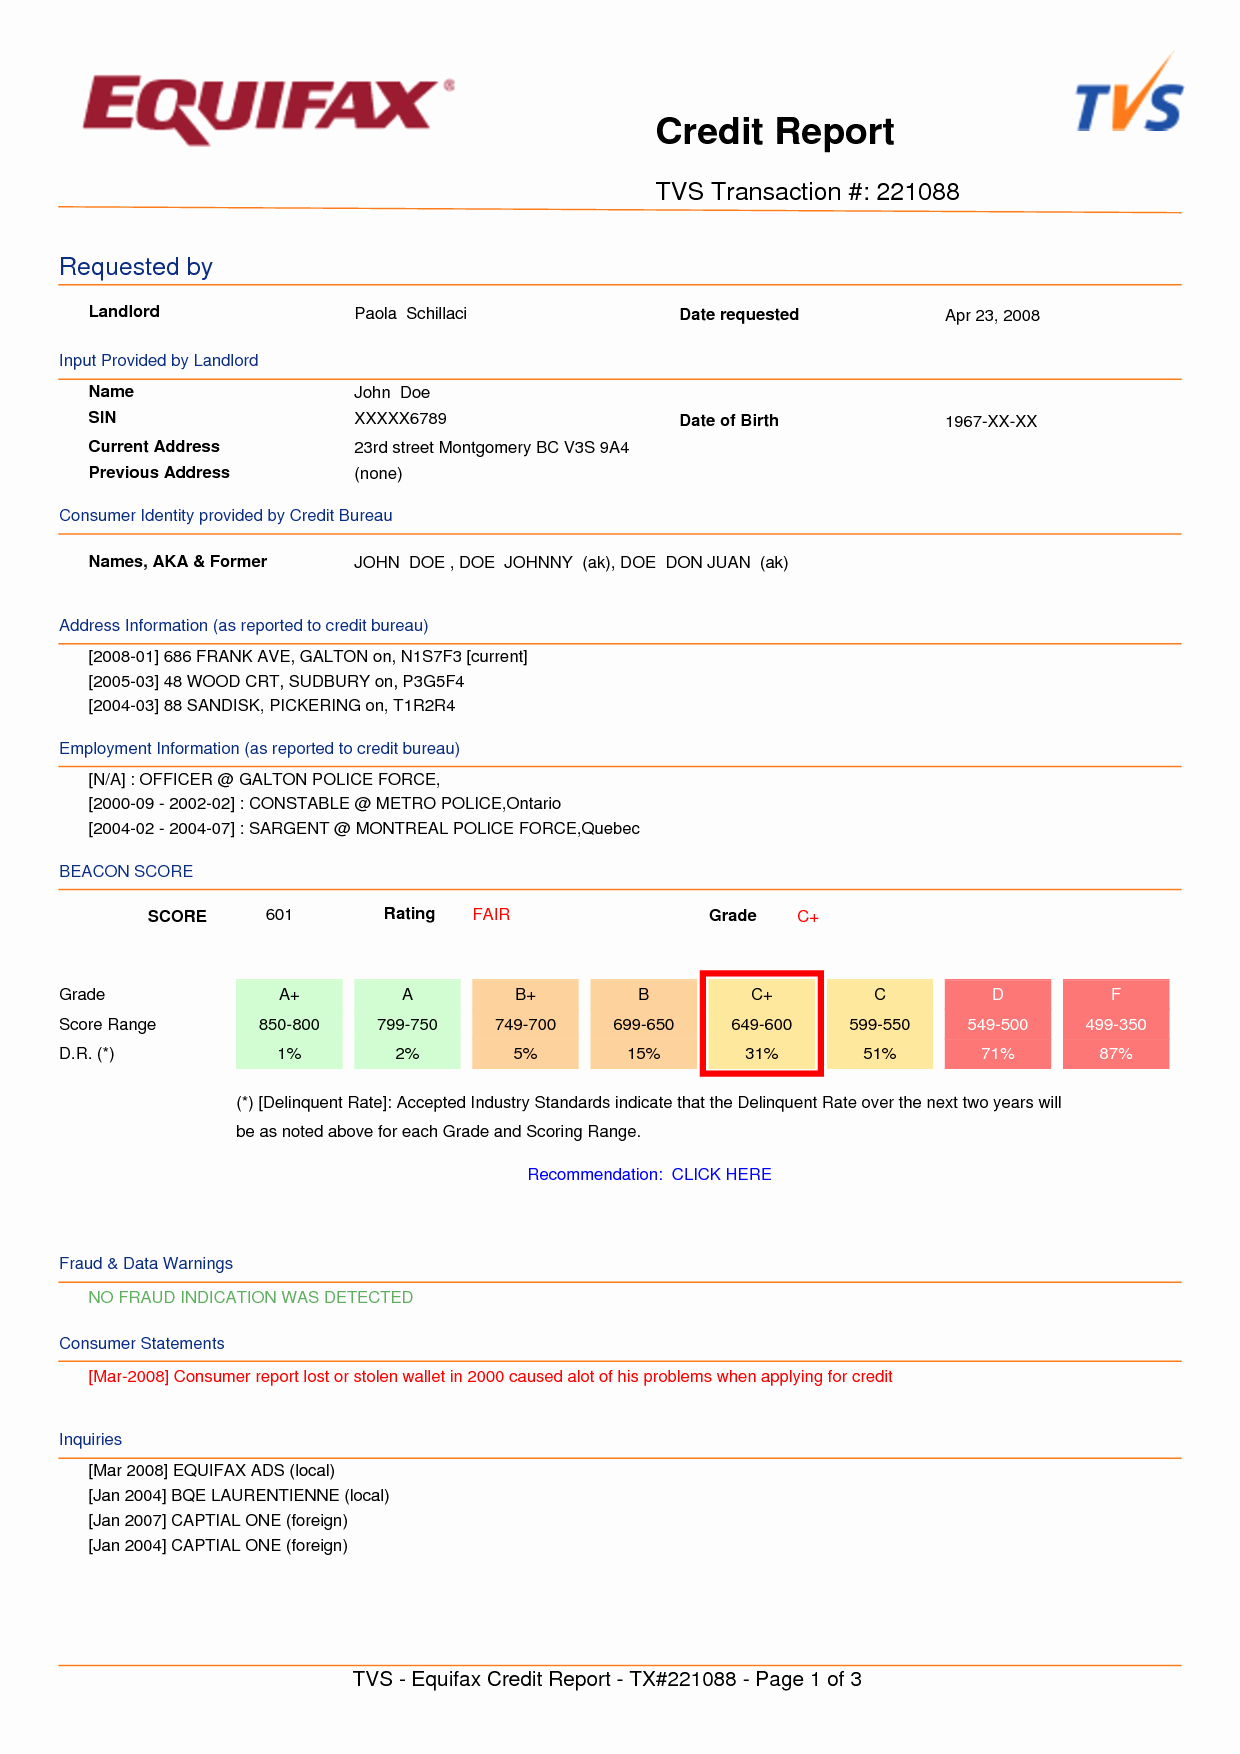 Fake Credit Report Template Unique Index Of Cdn 12 1995 982